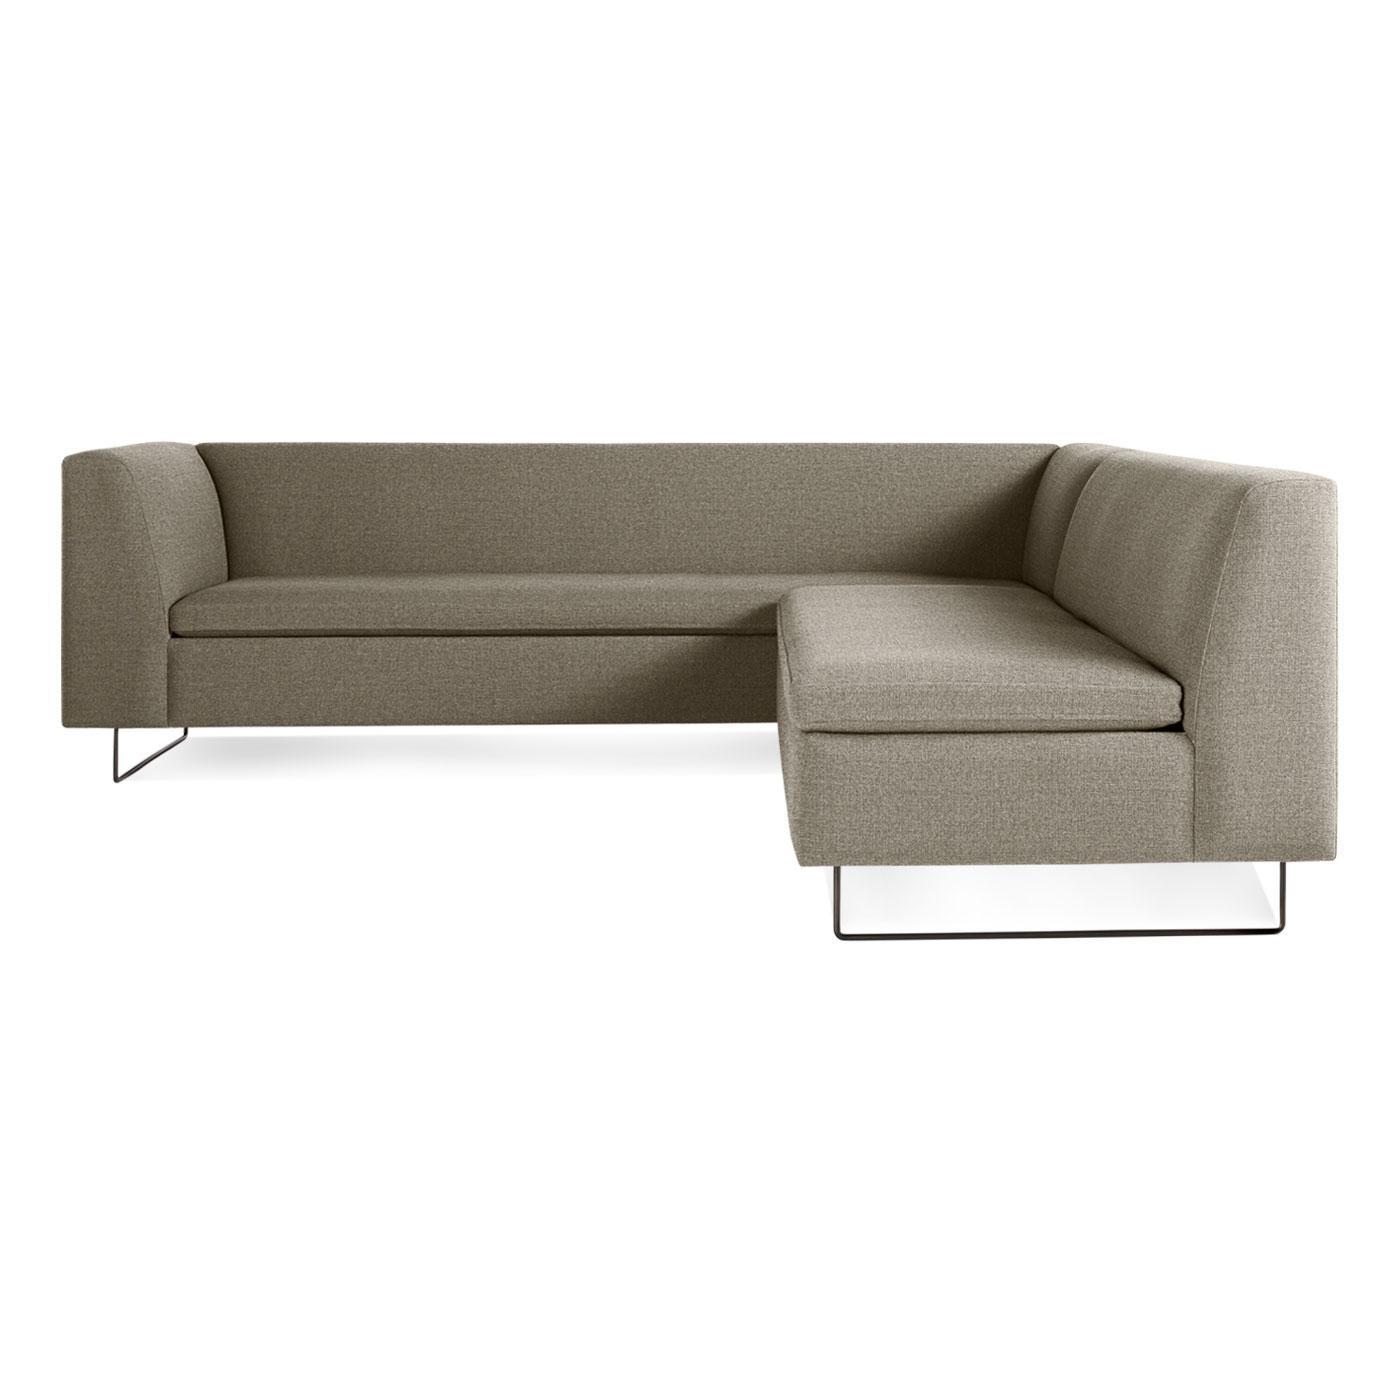 Collection Sleek Sectional Sofa – Mediasupload Inside Sleek Sectional Sofas (View 2 of 10)